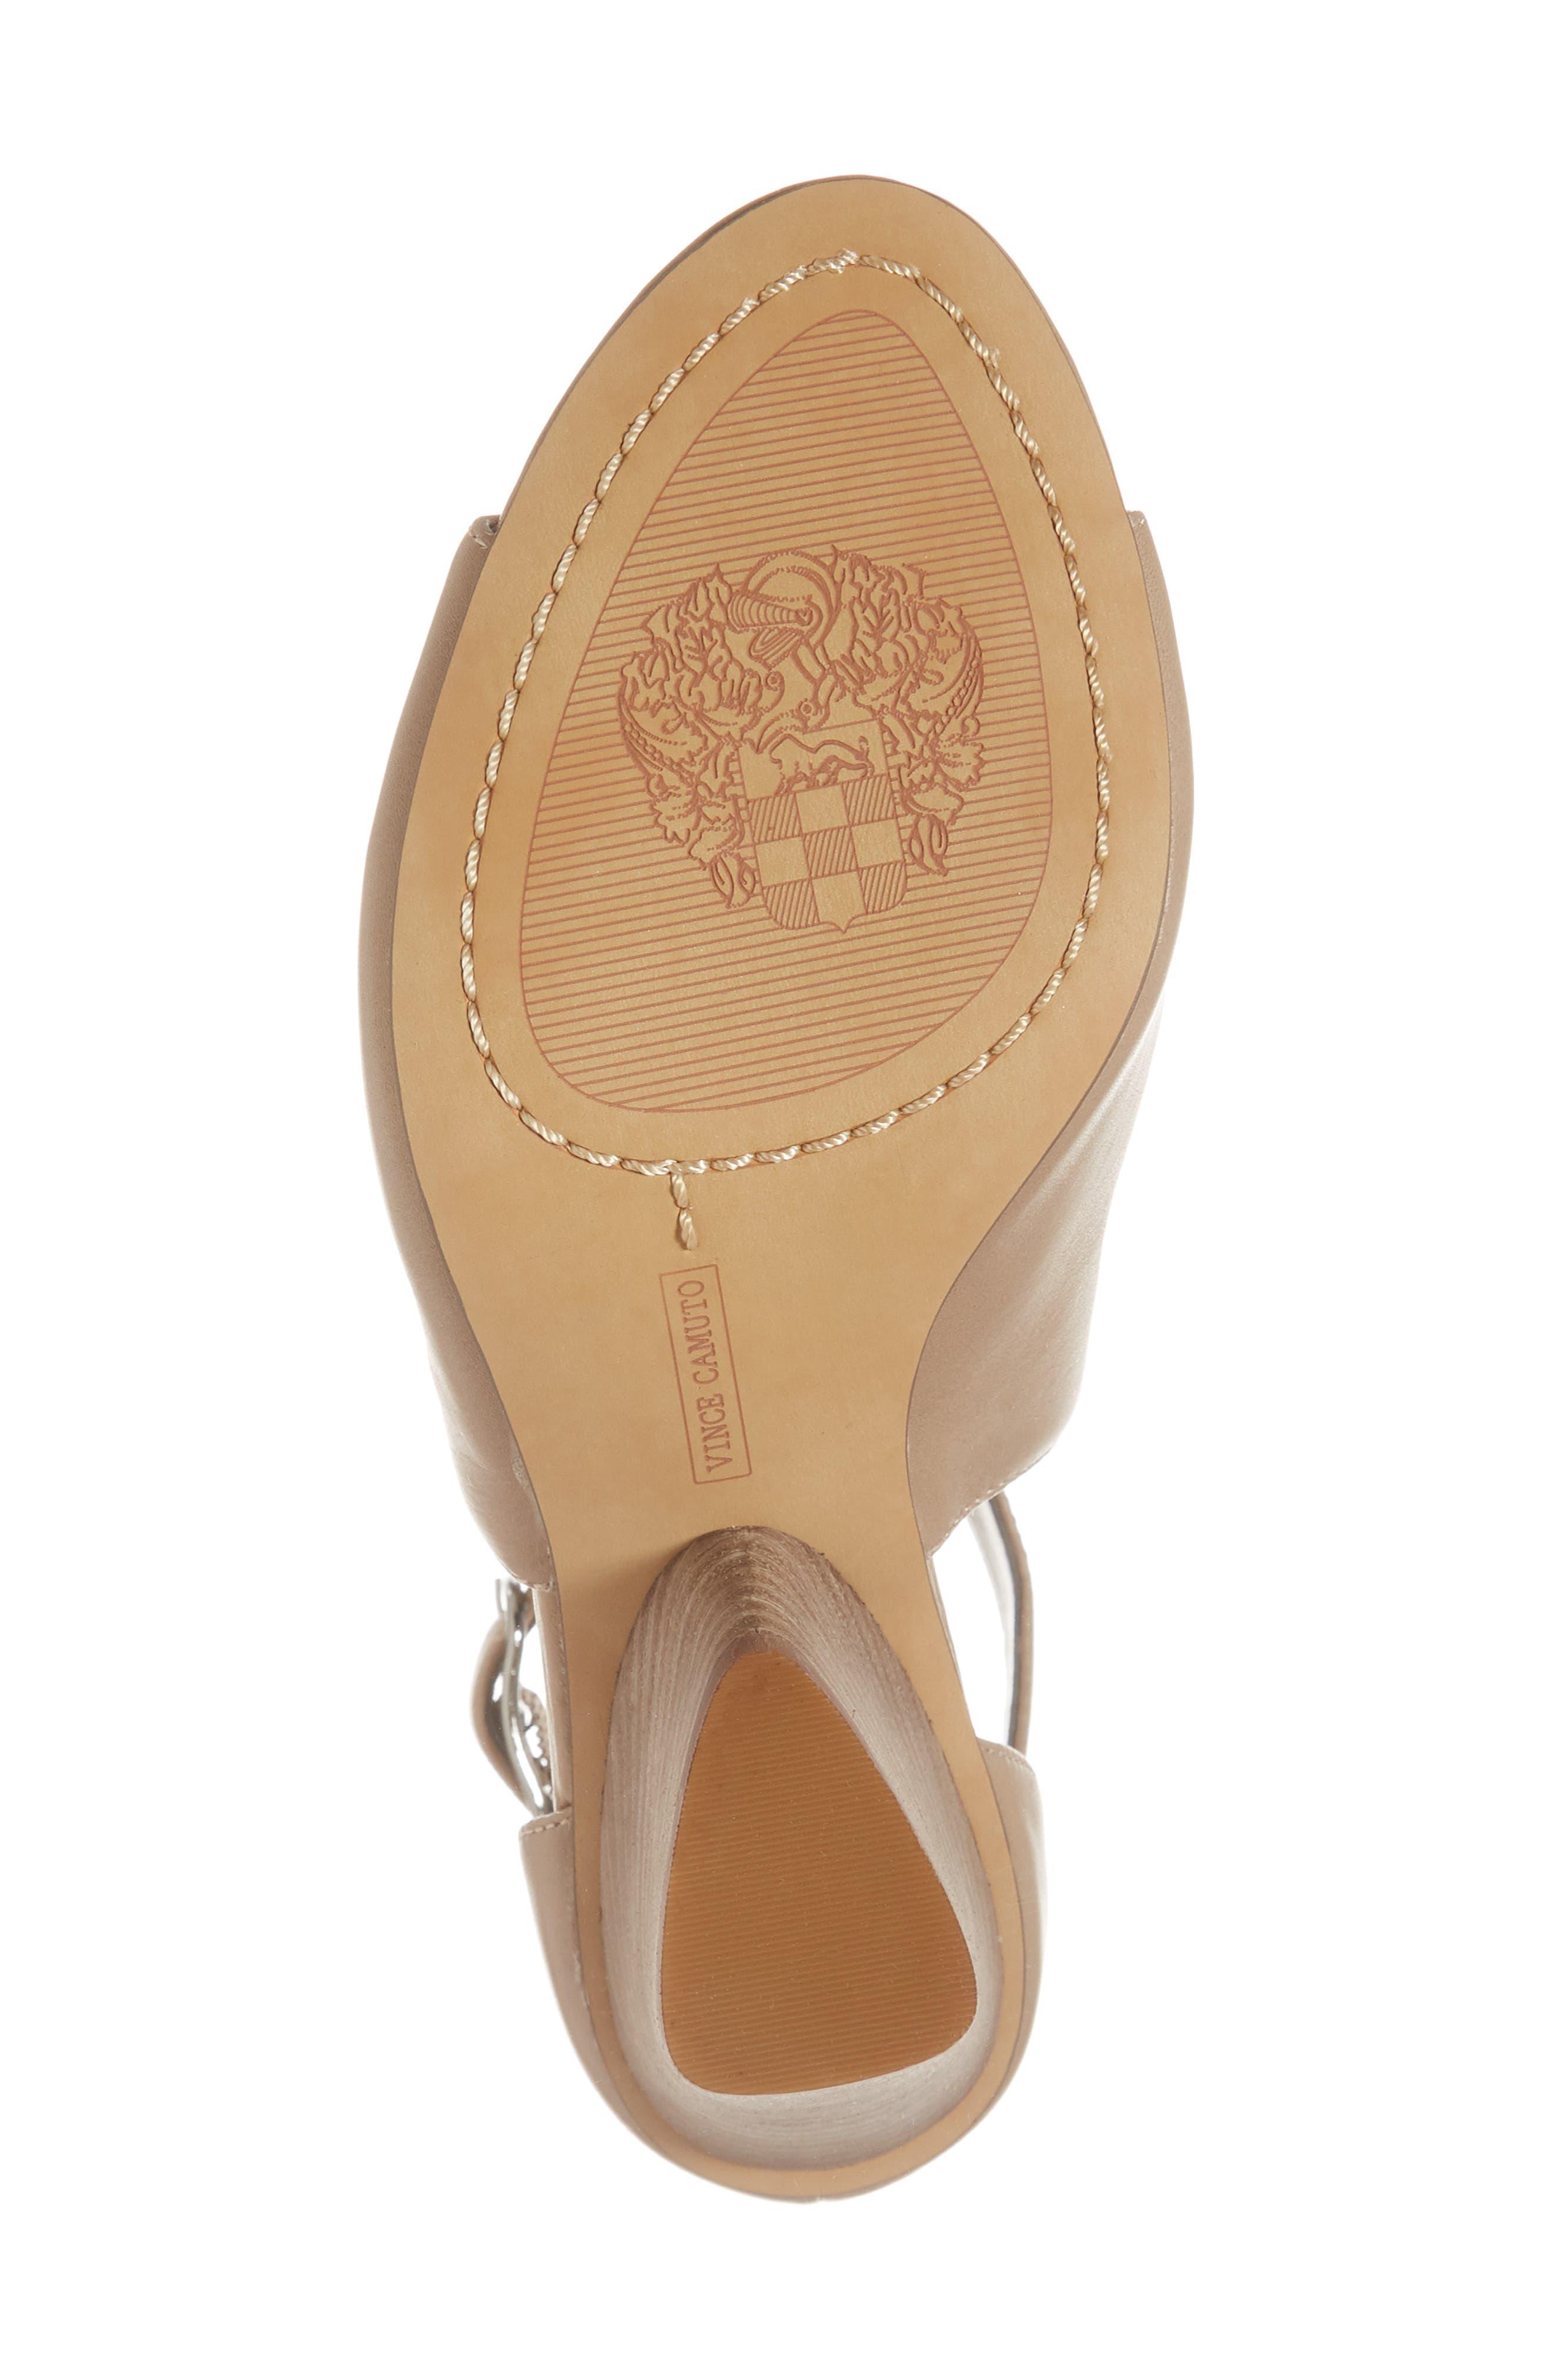 Adaren Peep Toe Sandal,                             Alternate thumbnail 6, color,                             Dusty Trail Leather